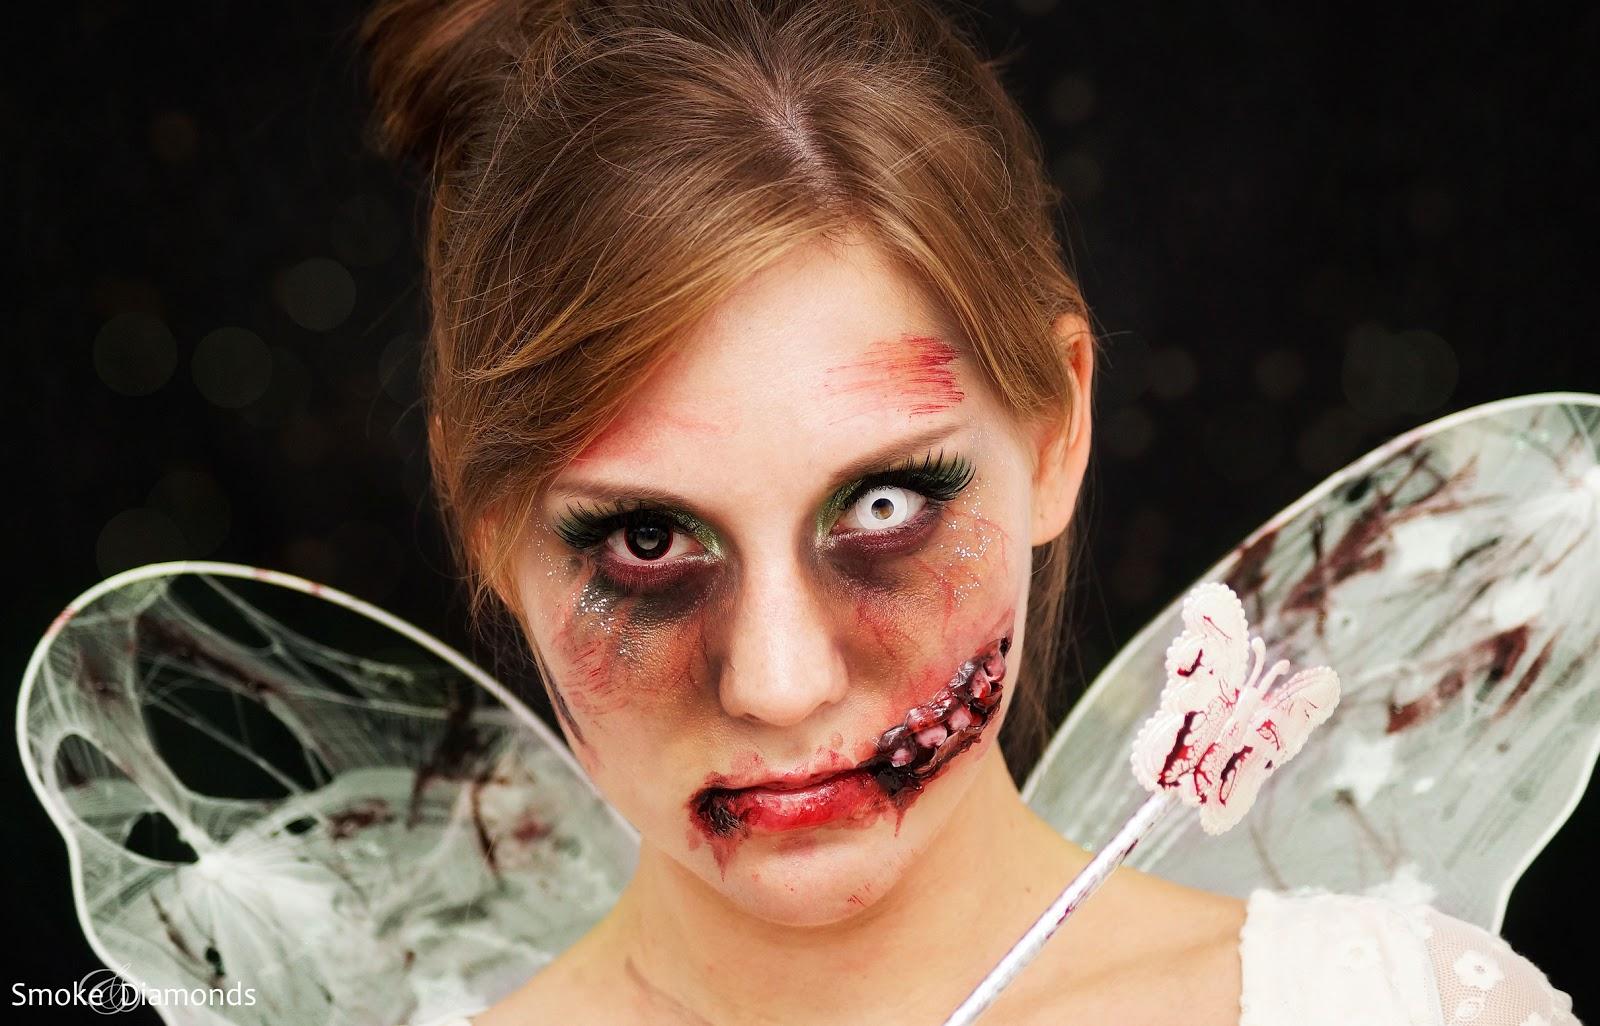 >bilder gesucht< (Schminke, schminken, Karneval  - Clown Schminktipps Bilder